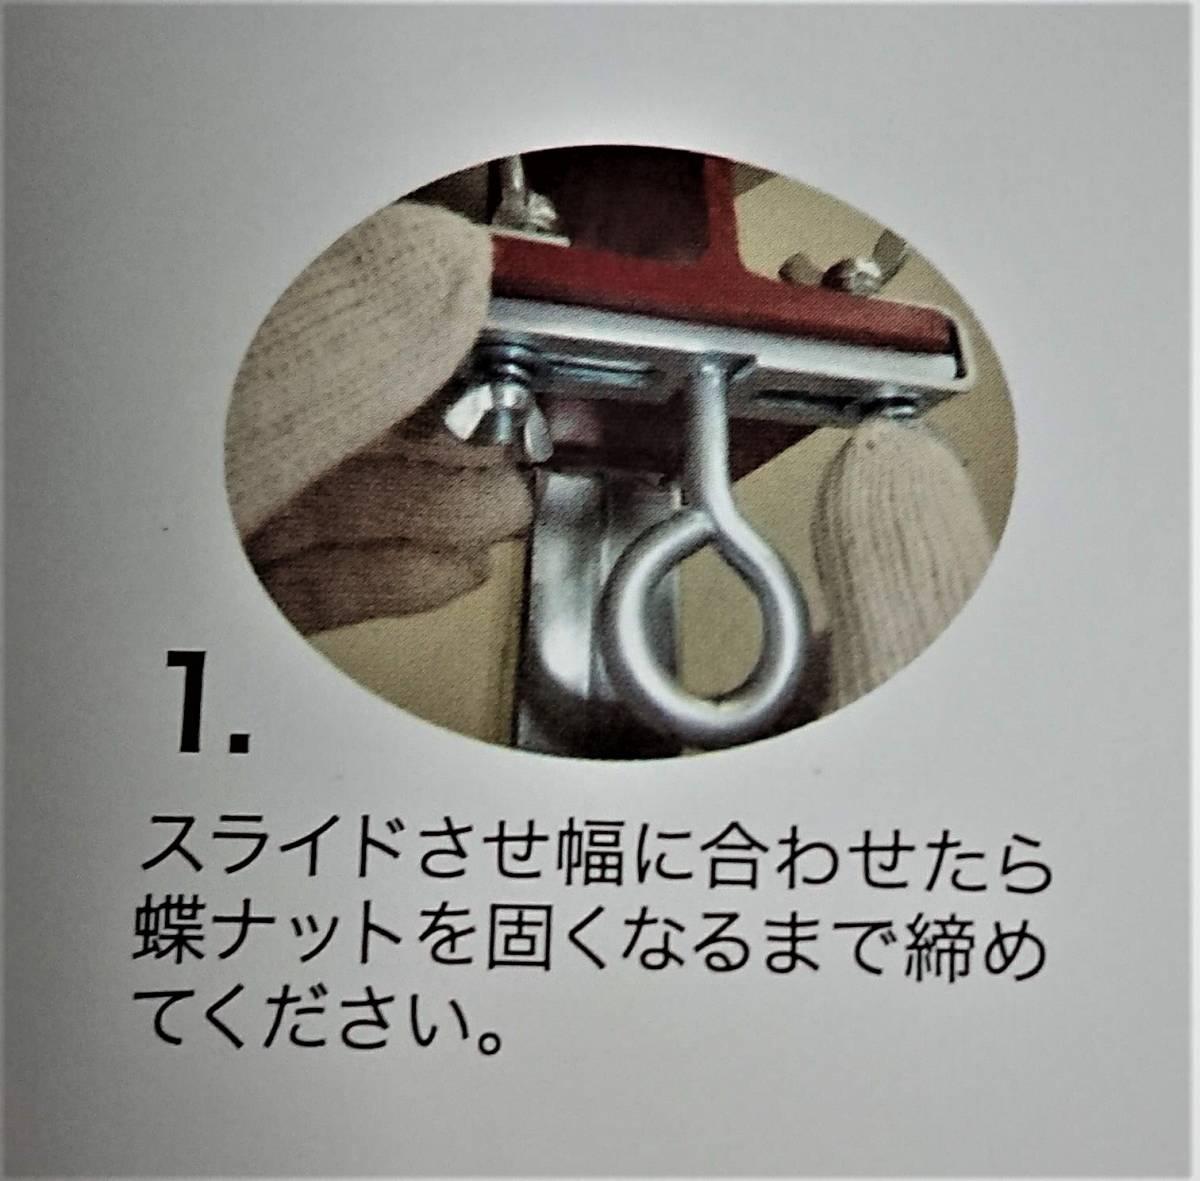 H鋼吊る~す(大・10個セット) H鋼吊り金具 H鋼吊るす ヒートン_画像2